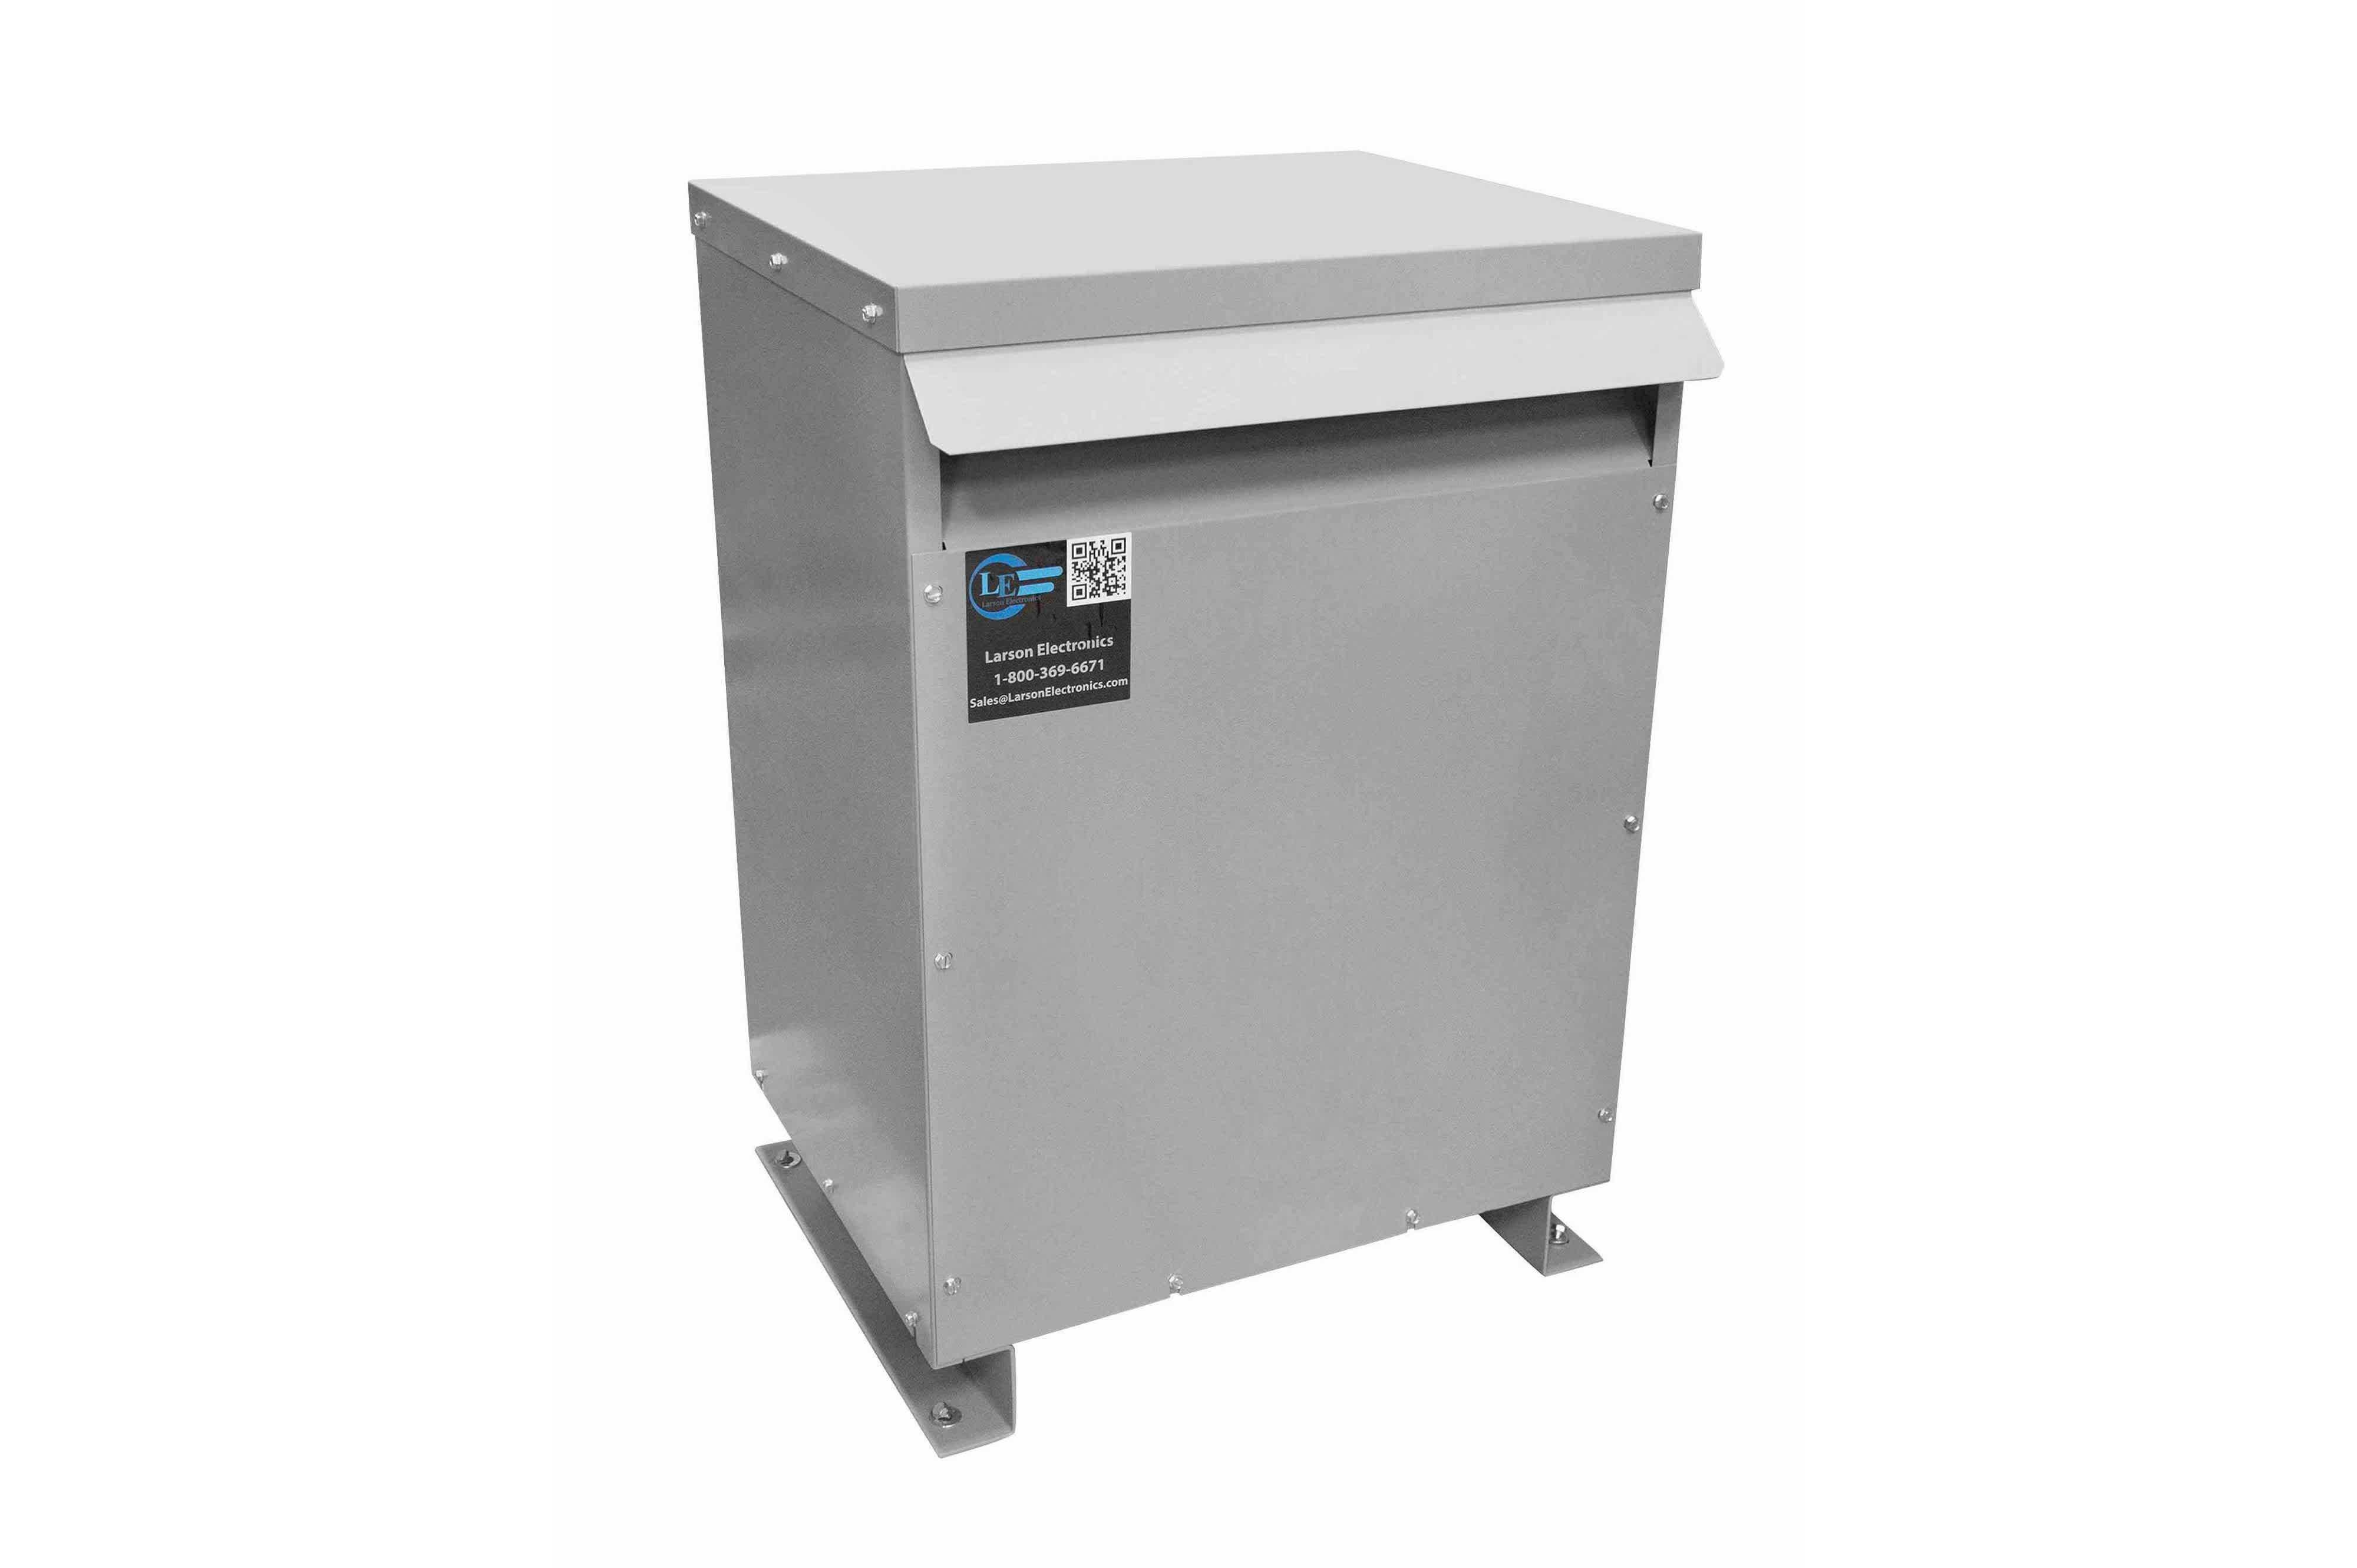 400 kVA 3PH DOE Transformer, 208V Delta Primary, 208Y/120 Wye-N Secondary, N3R, Ventilated, 60 Hz